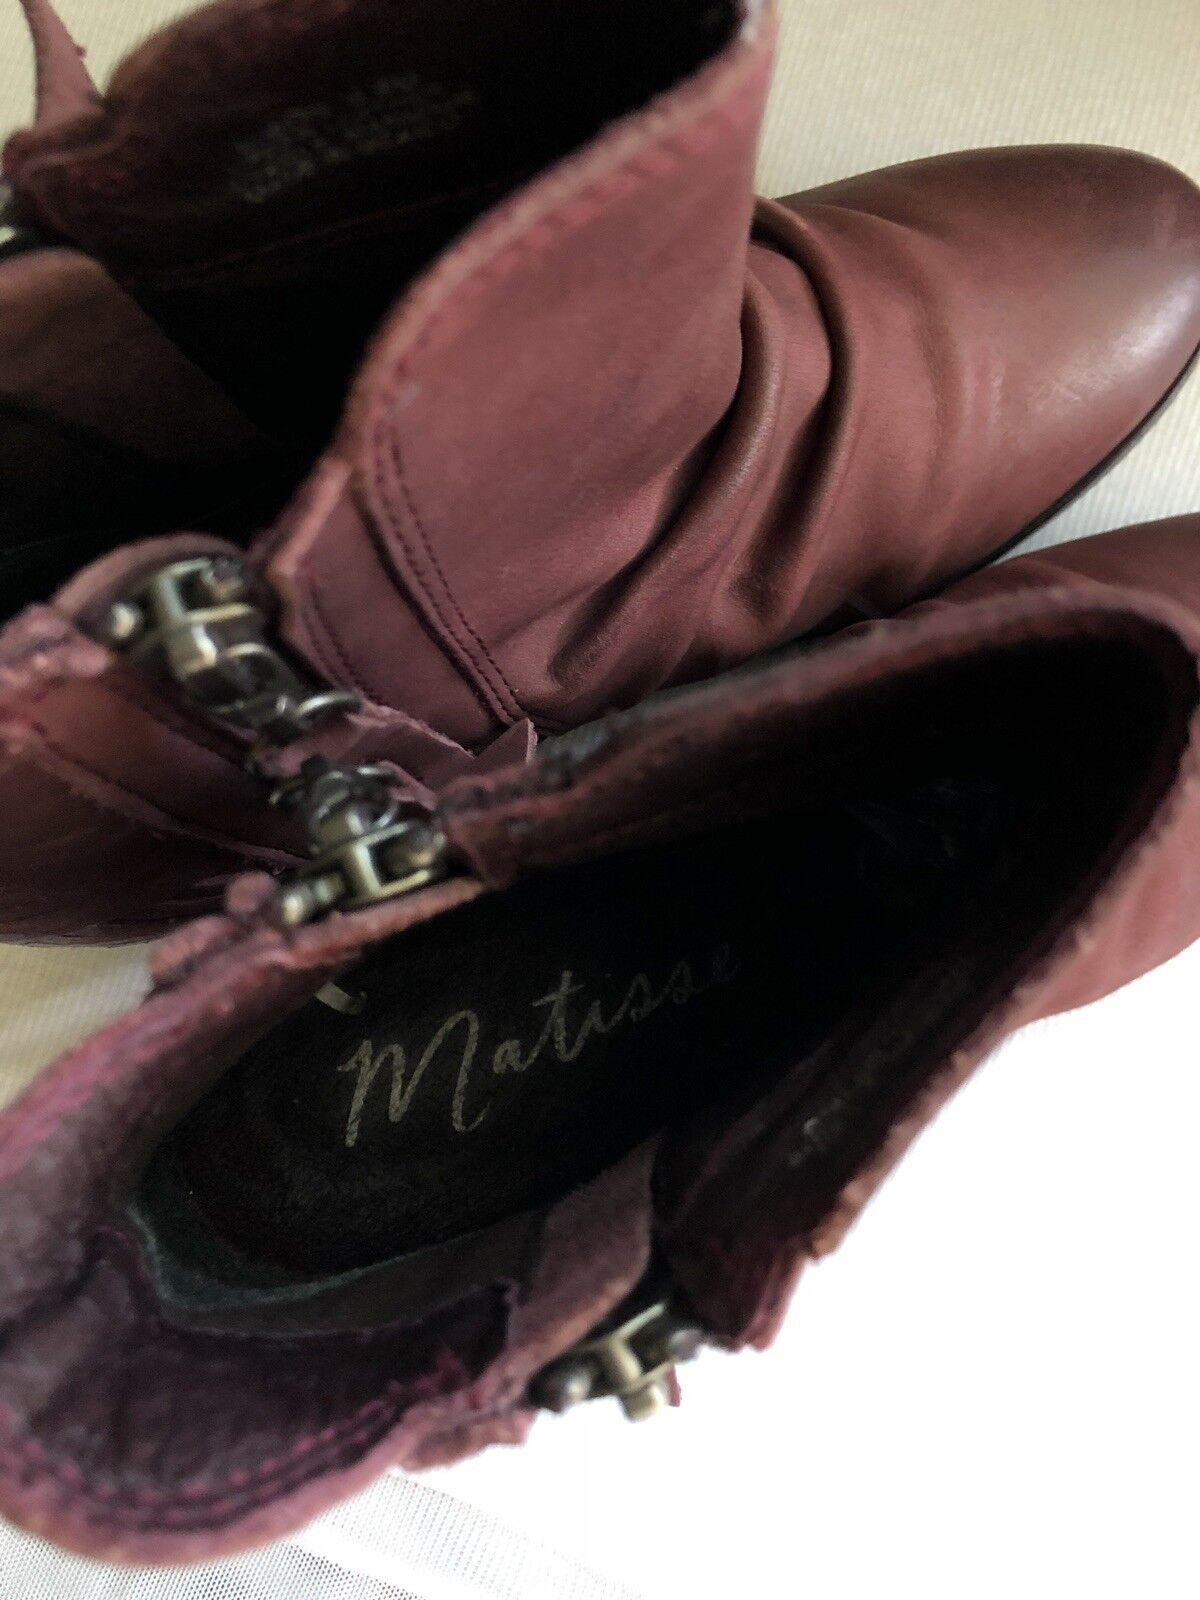 Matisse Bison en daim daim daim cuir prune bordeaux Pointure 5.5 180   65e763